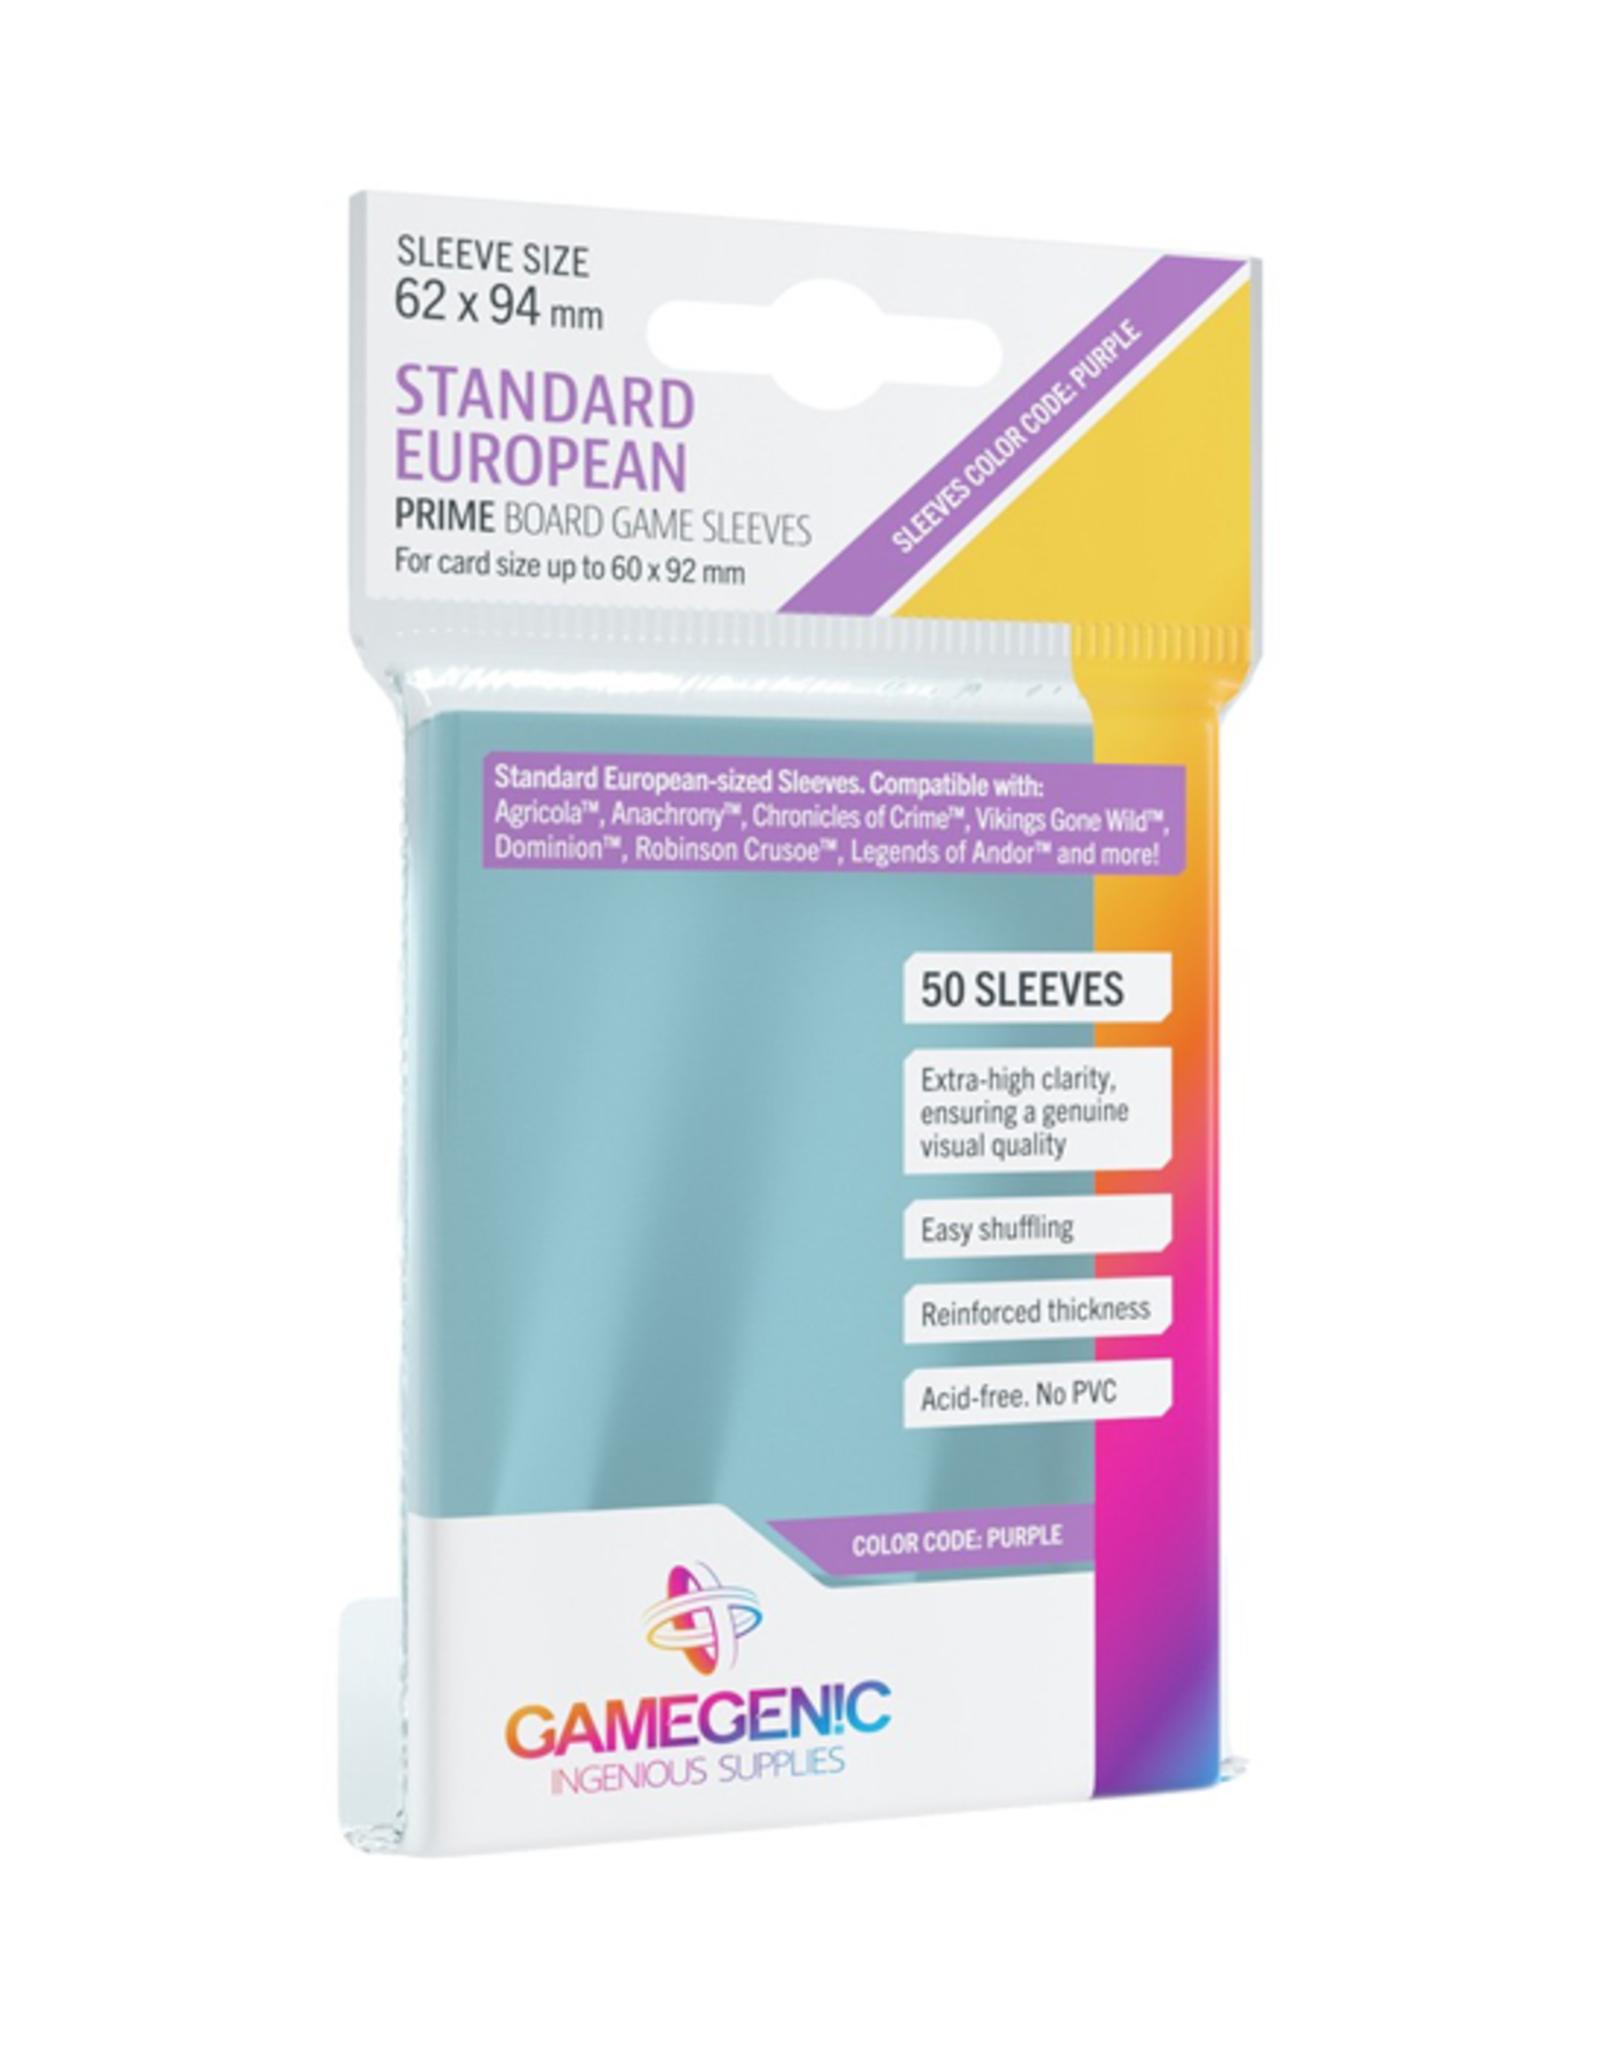 Gamegenic Gamegenic: Sleeves - Board Game - Standard European